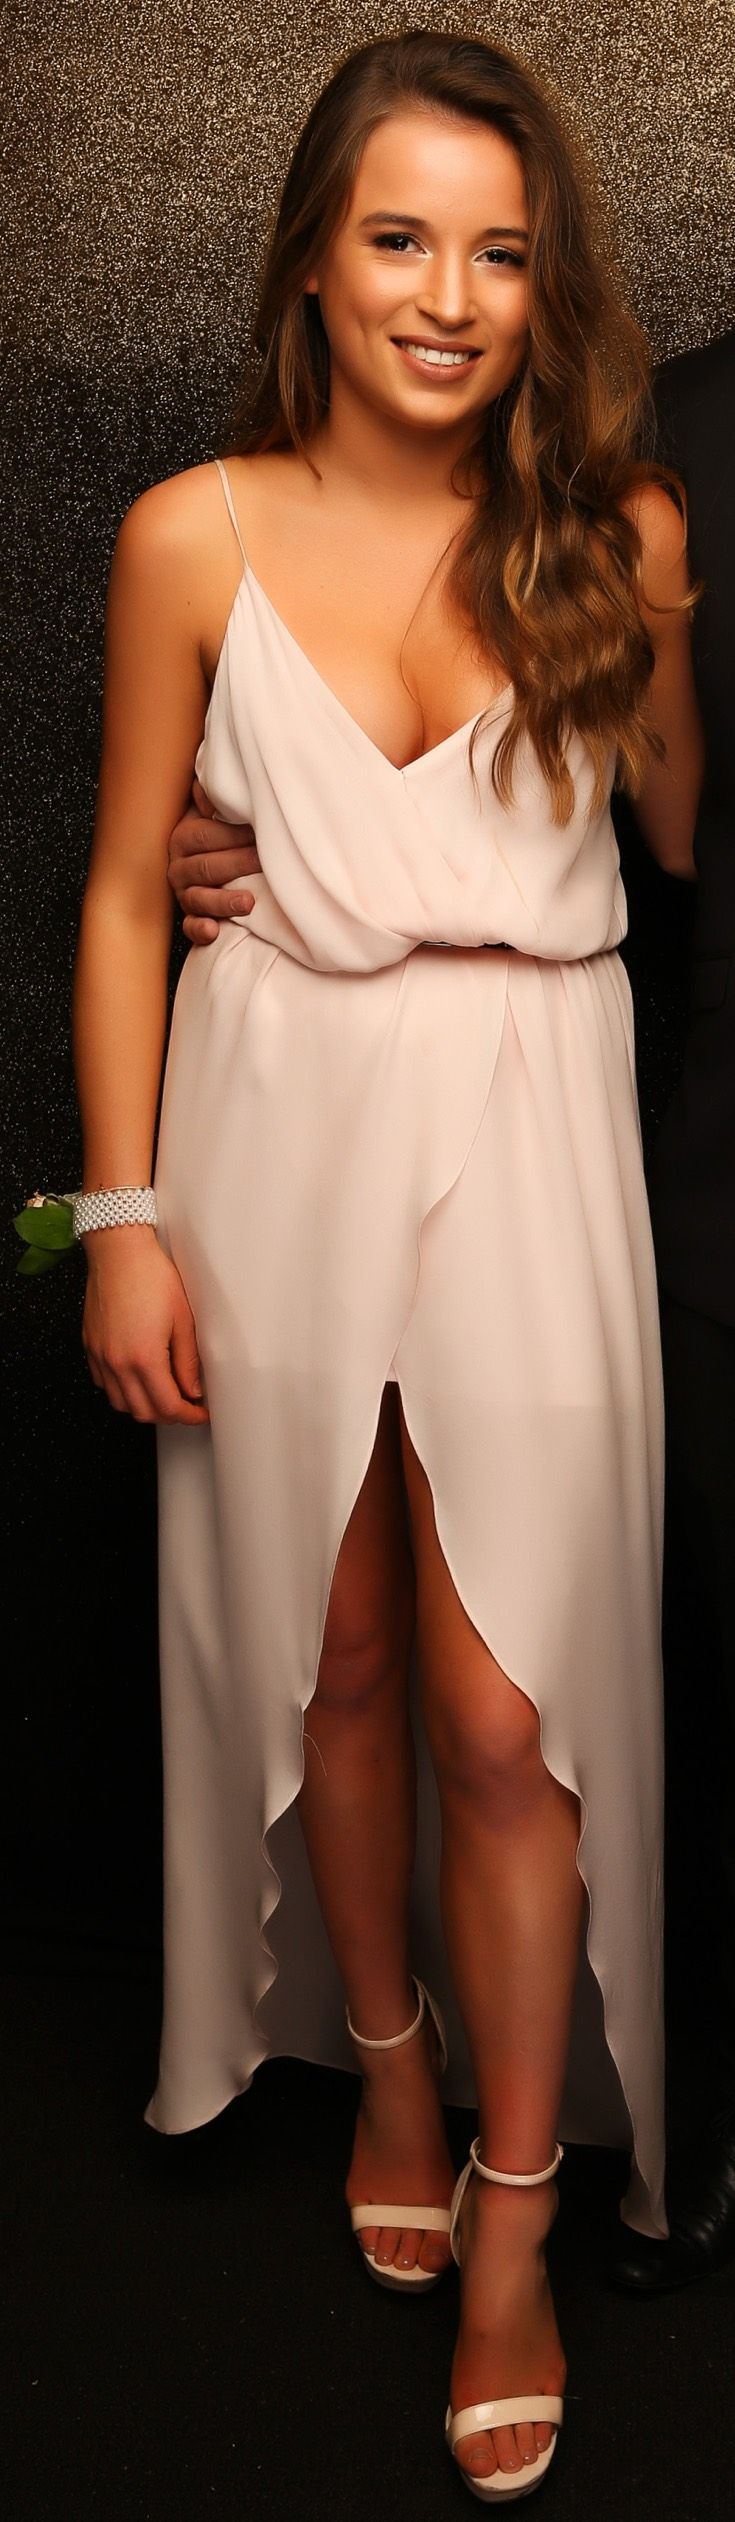 Sacred Heart Ball 2015. Adore this feminine look! www.whitedoor.co.nz